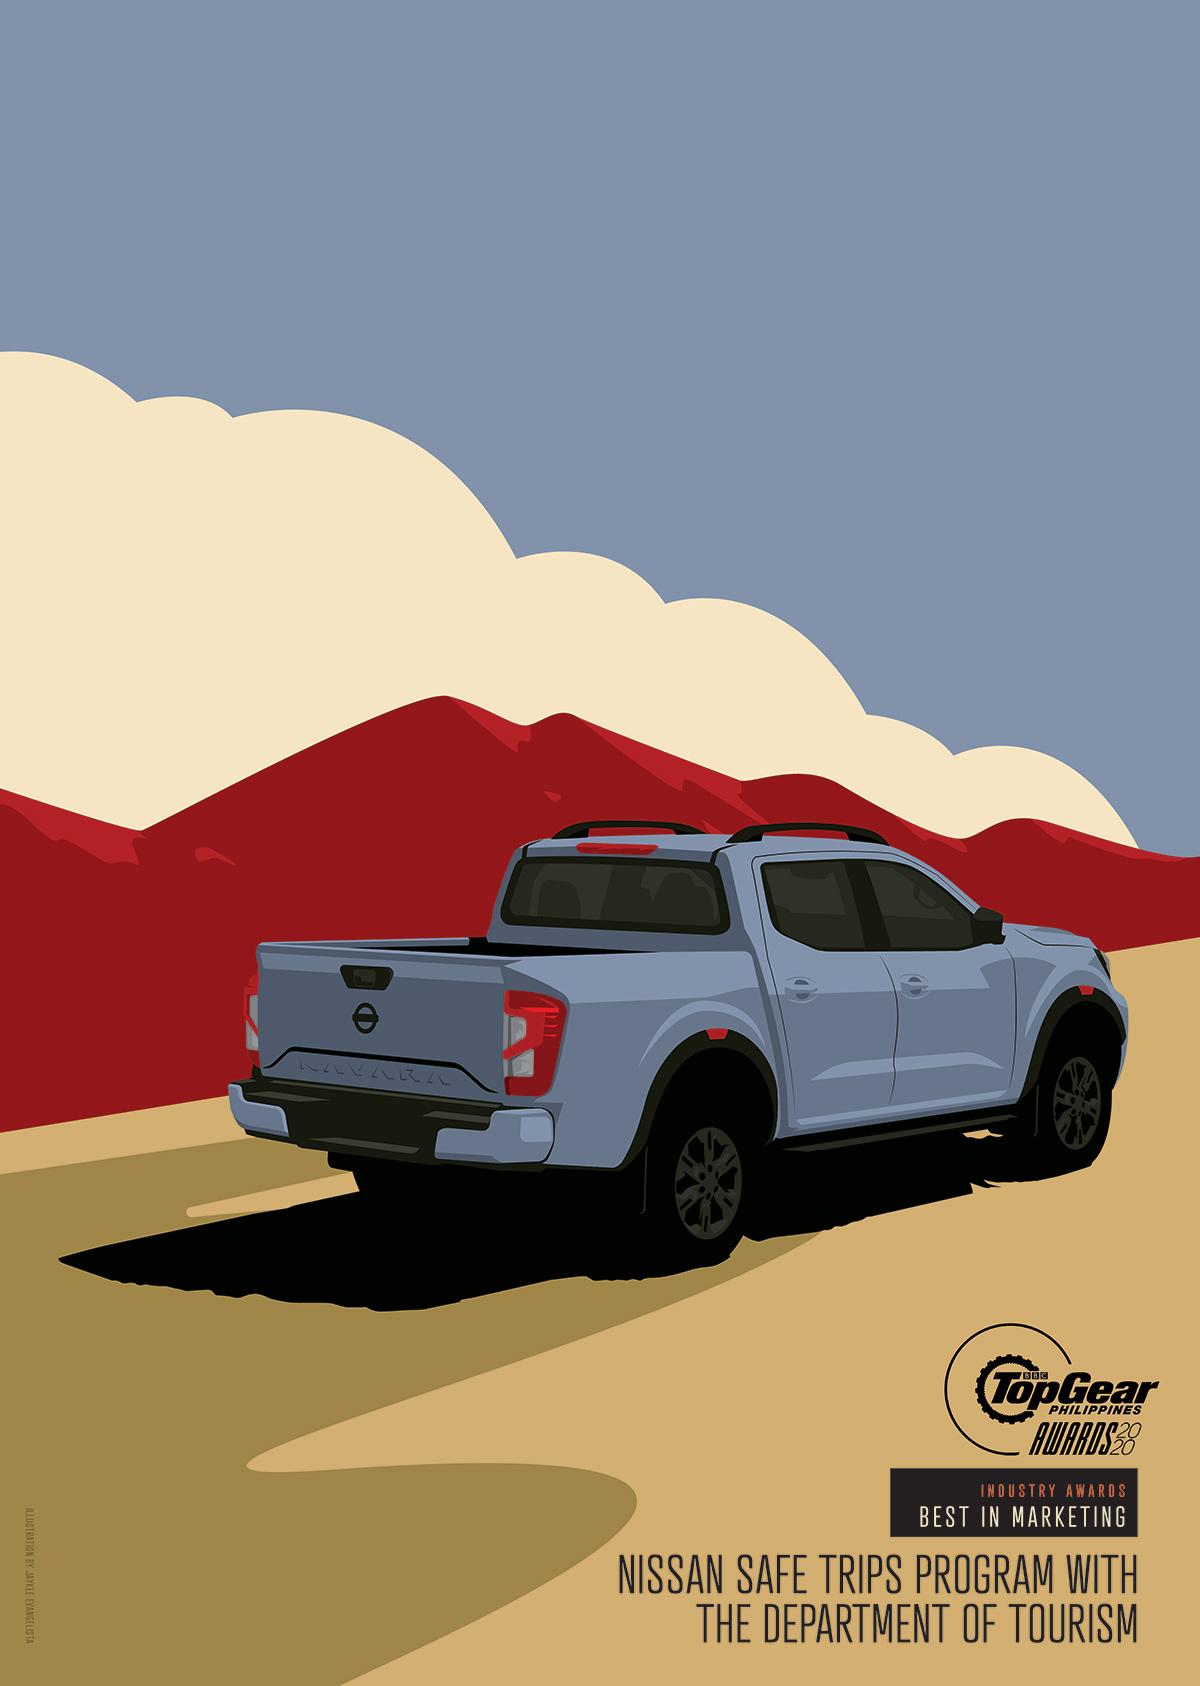 Top Gear Philippines' Best in Marketing – Nissan Safe Trips Program